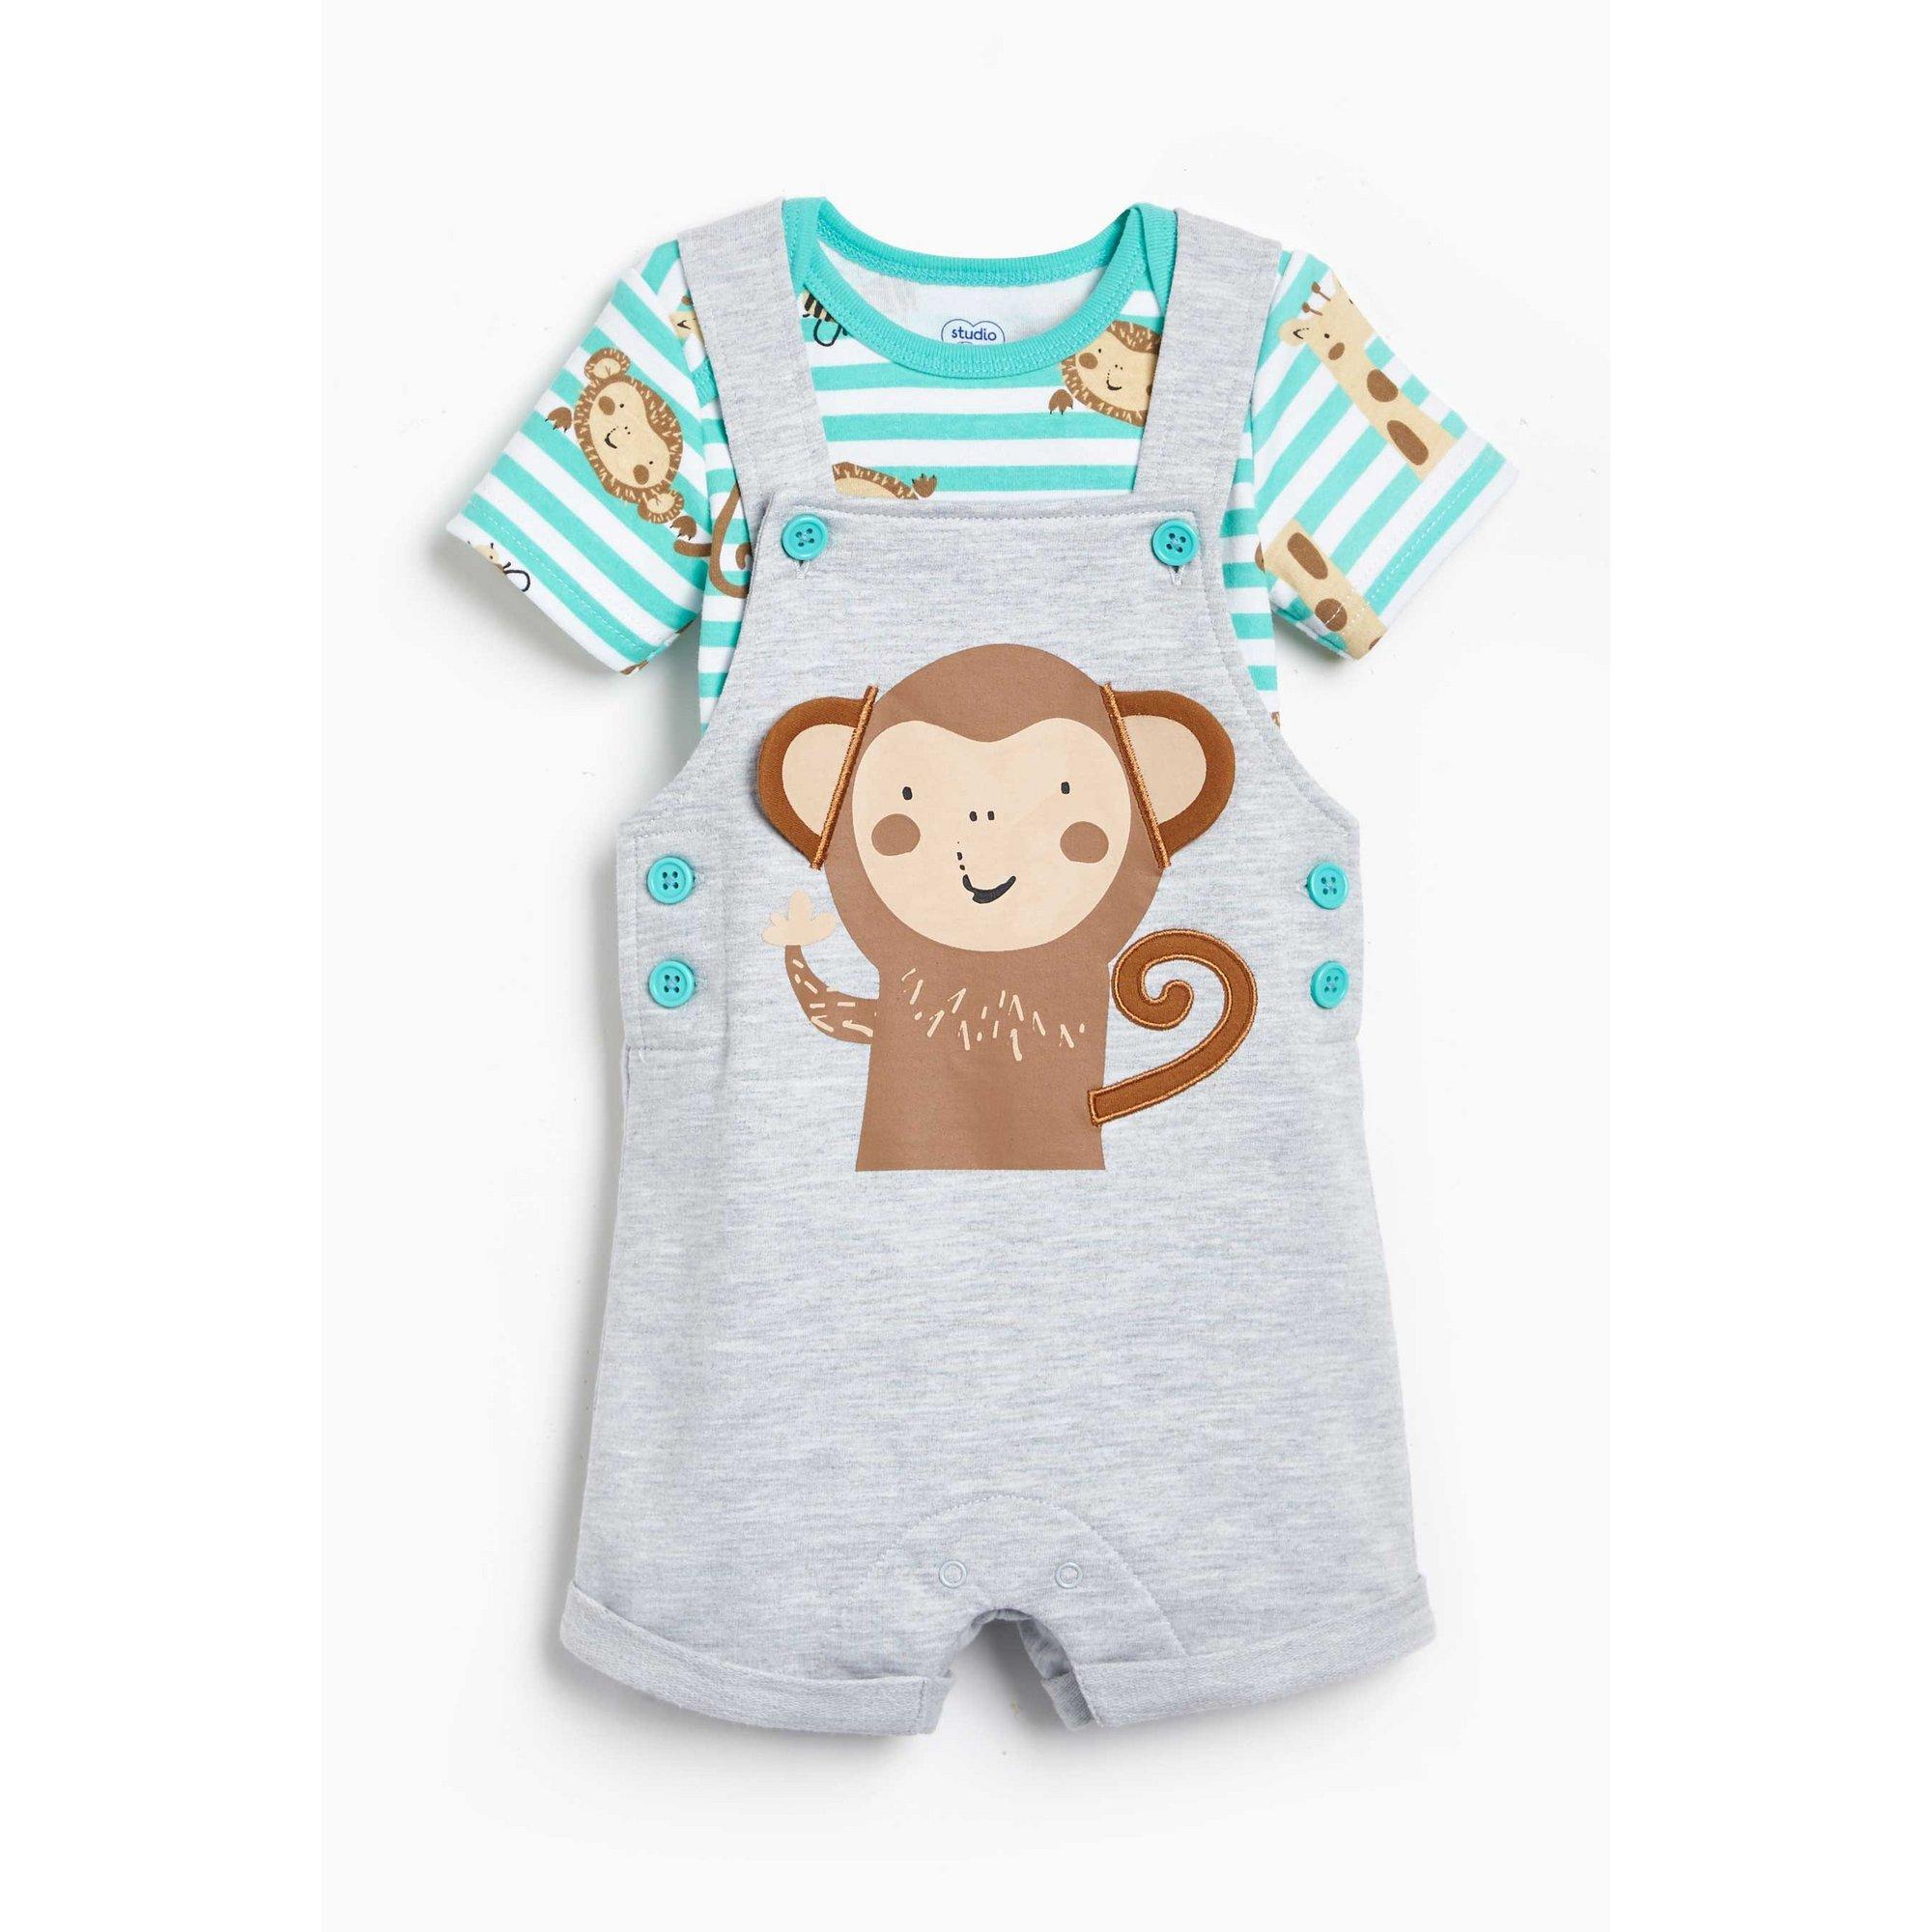 Image of Baby 2-Piece Monkey Dungaree and Stripe Bodysuit Set